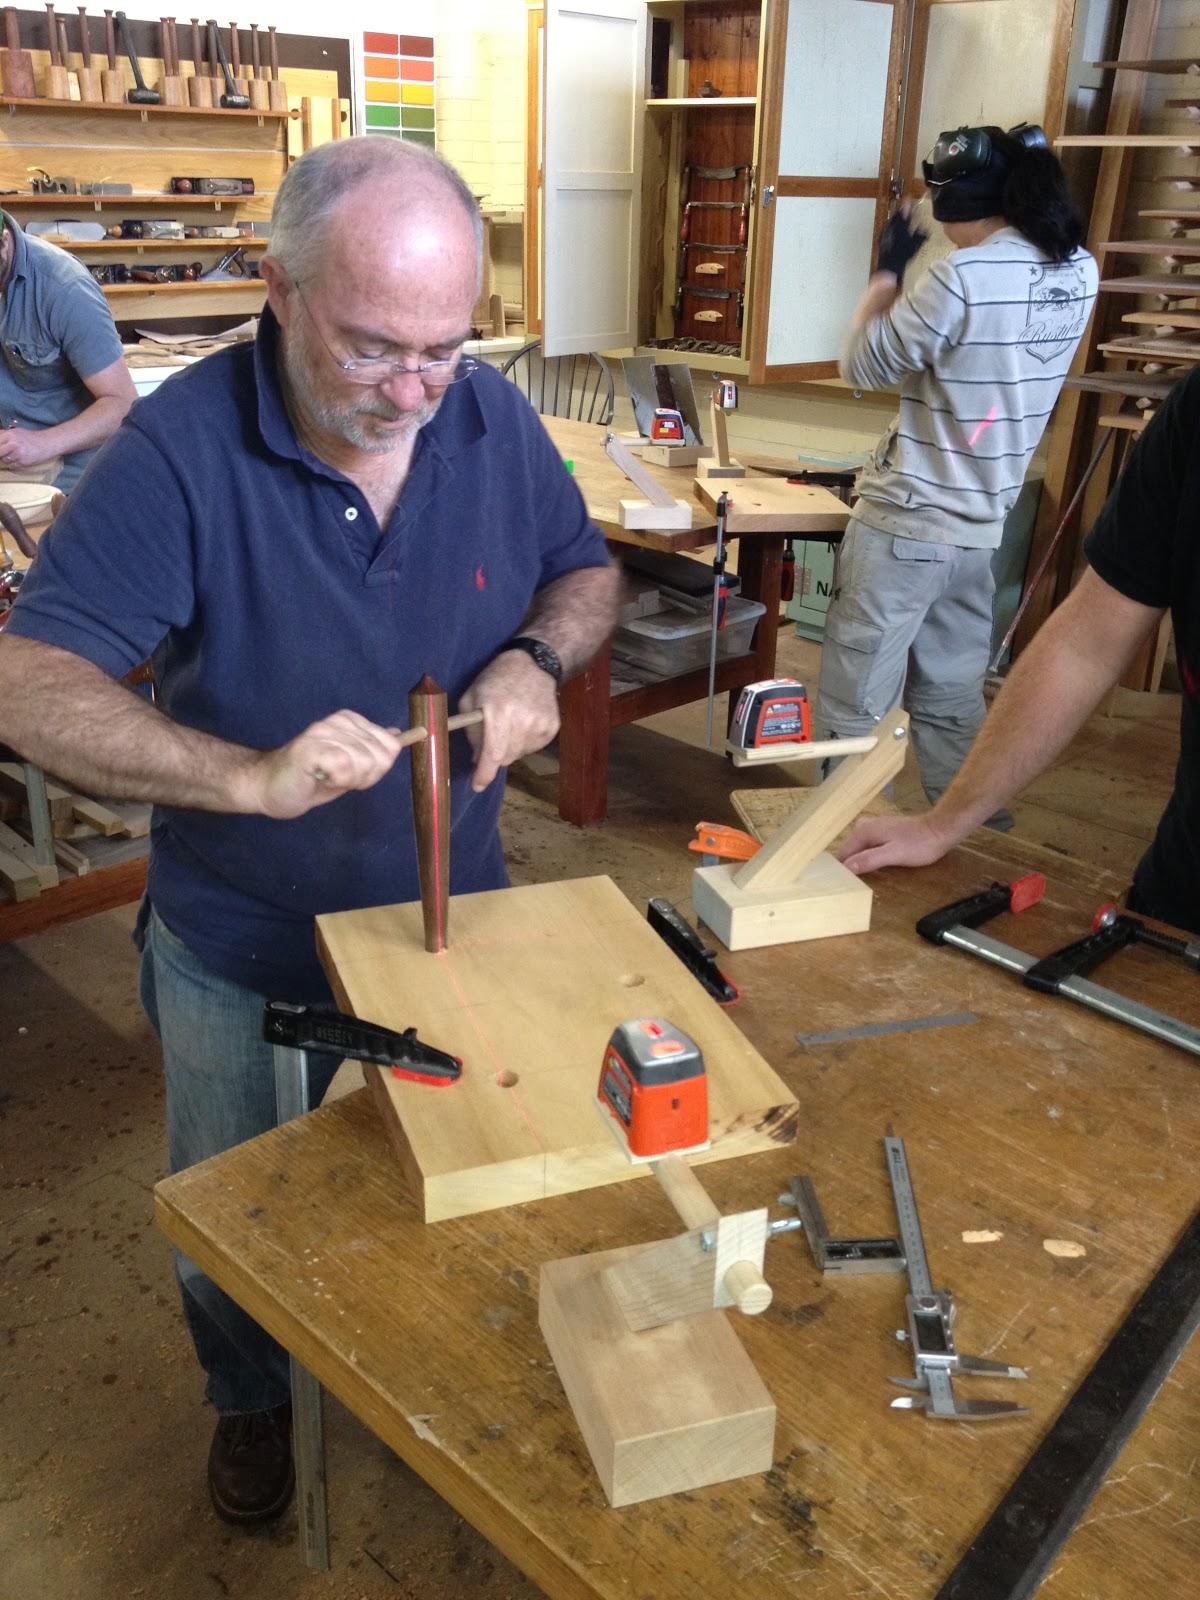 melbourne guild of fine woodworking instagram - of woodworking